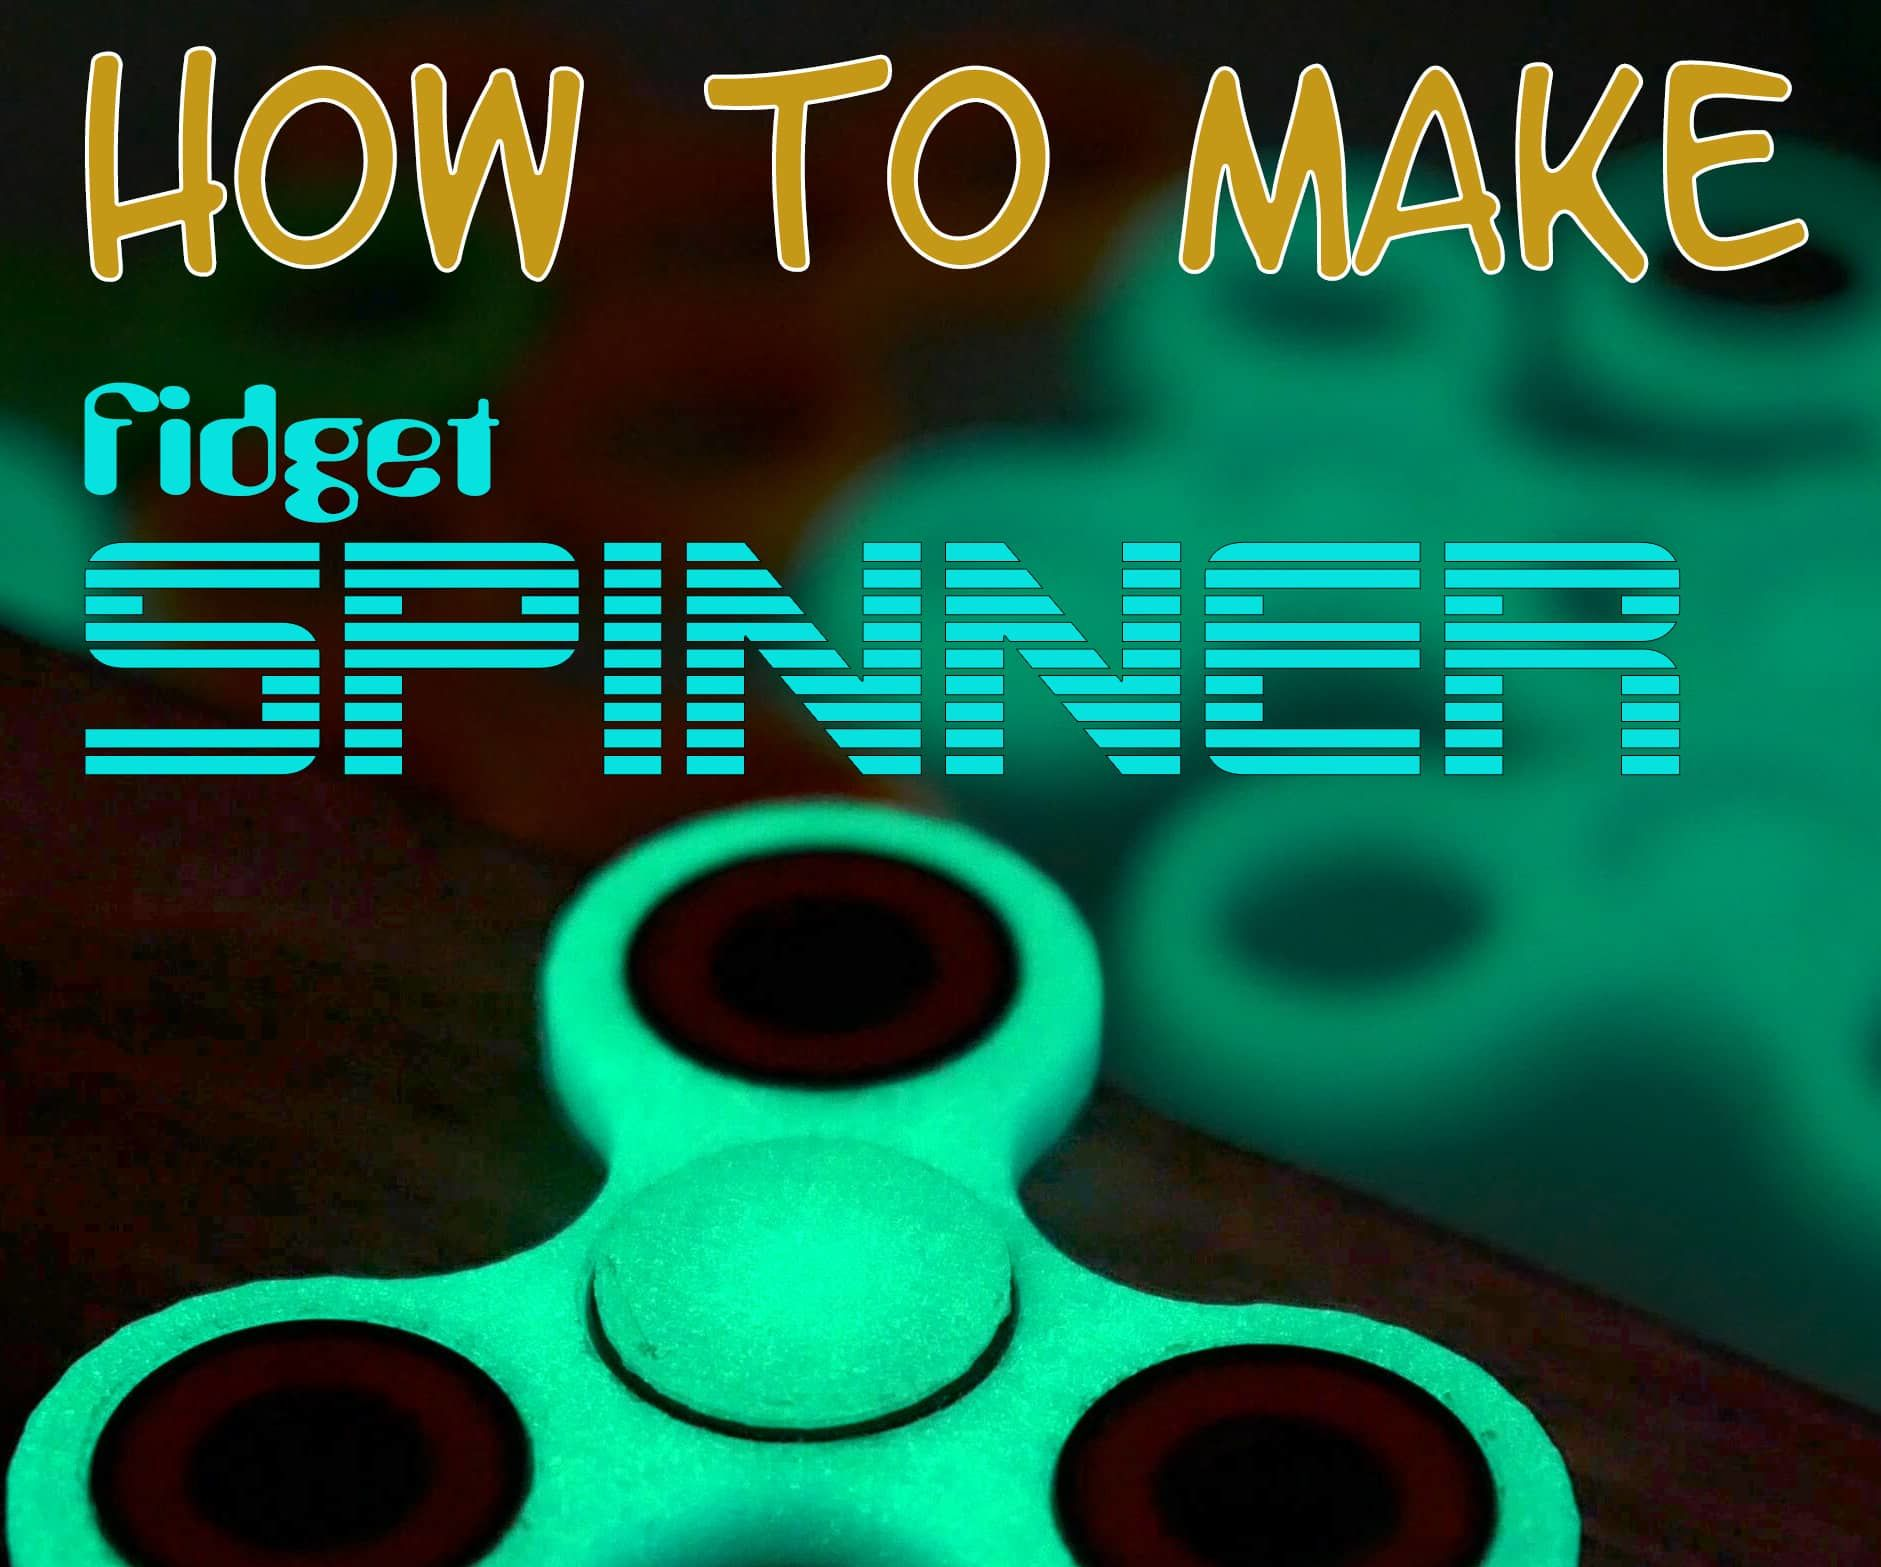 Fidget Spinner Glowing in the Dark